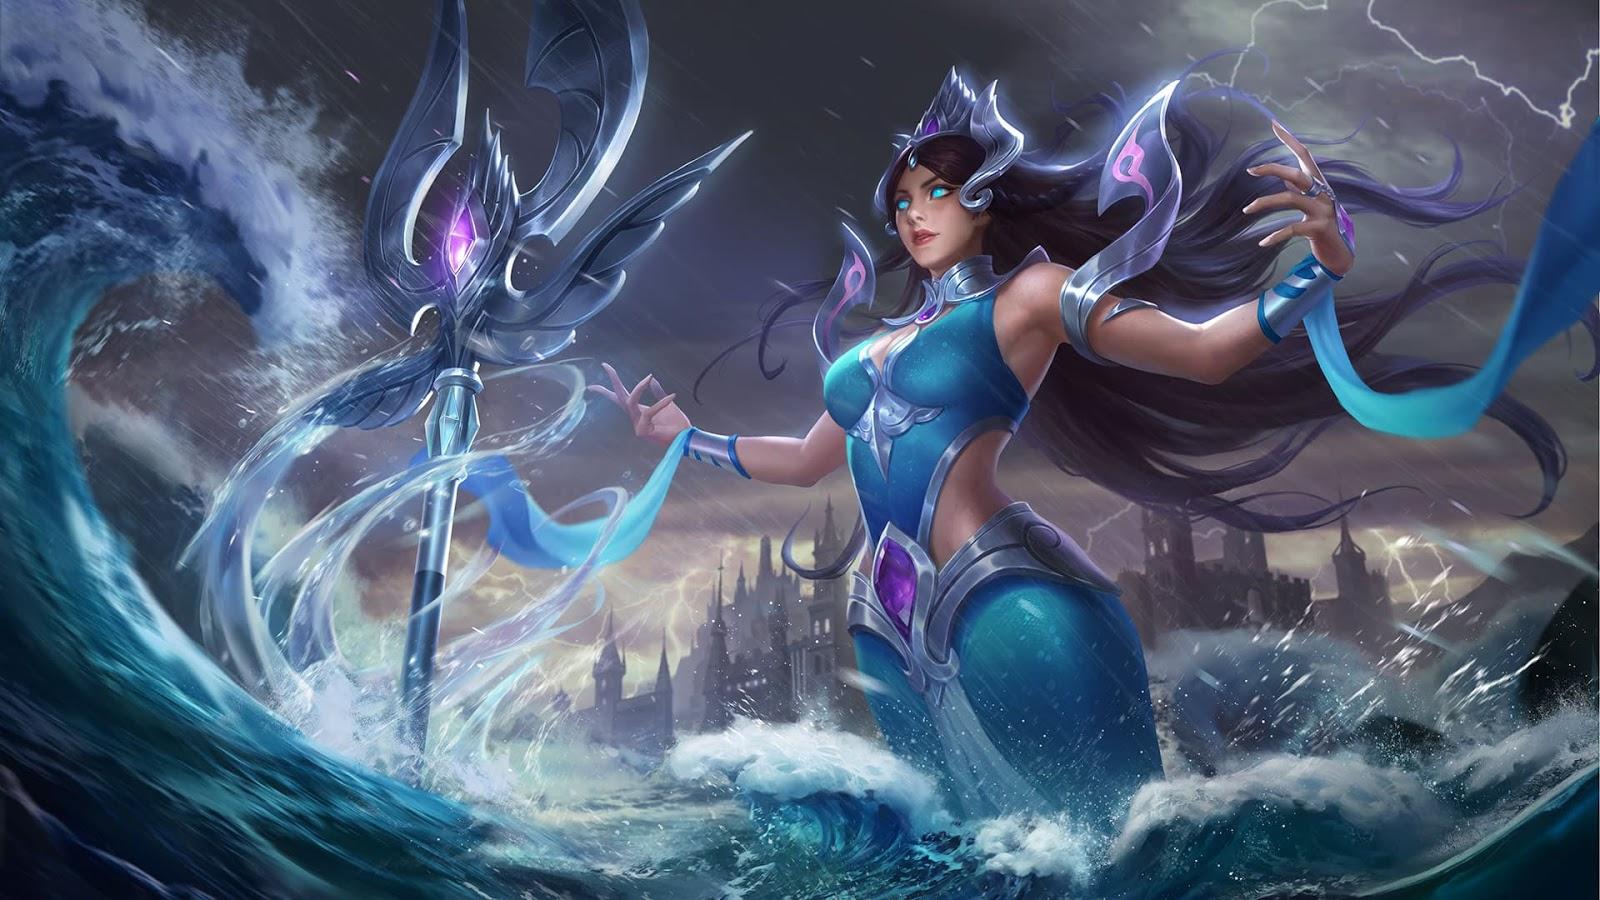 Wallpaper Kadita Atlantean Princess Skin Mobile Legends HD for PC